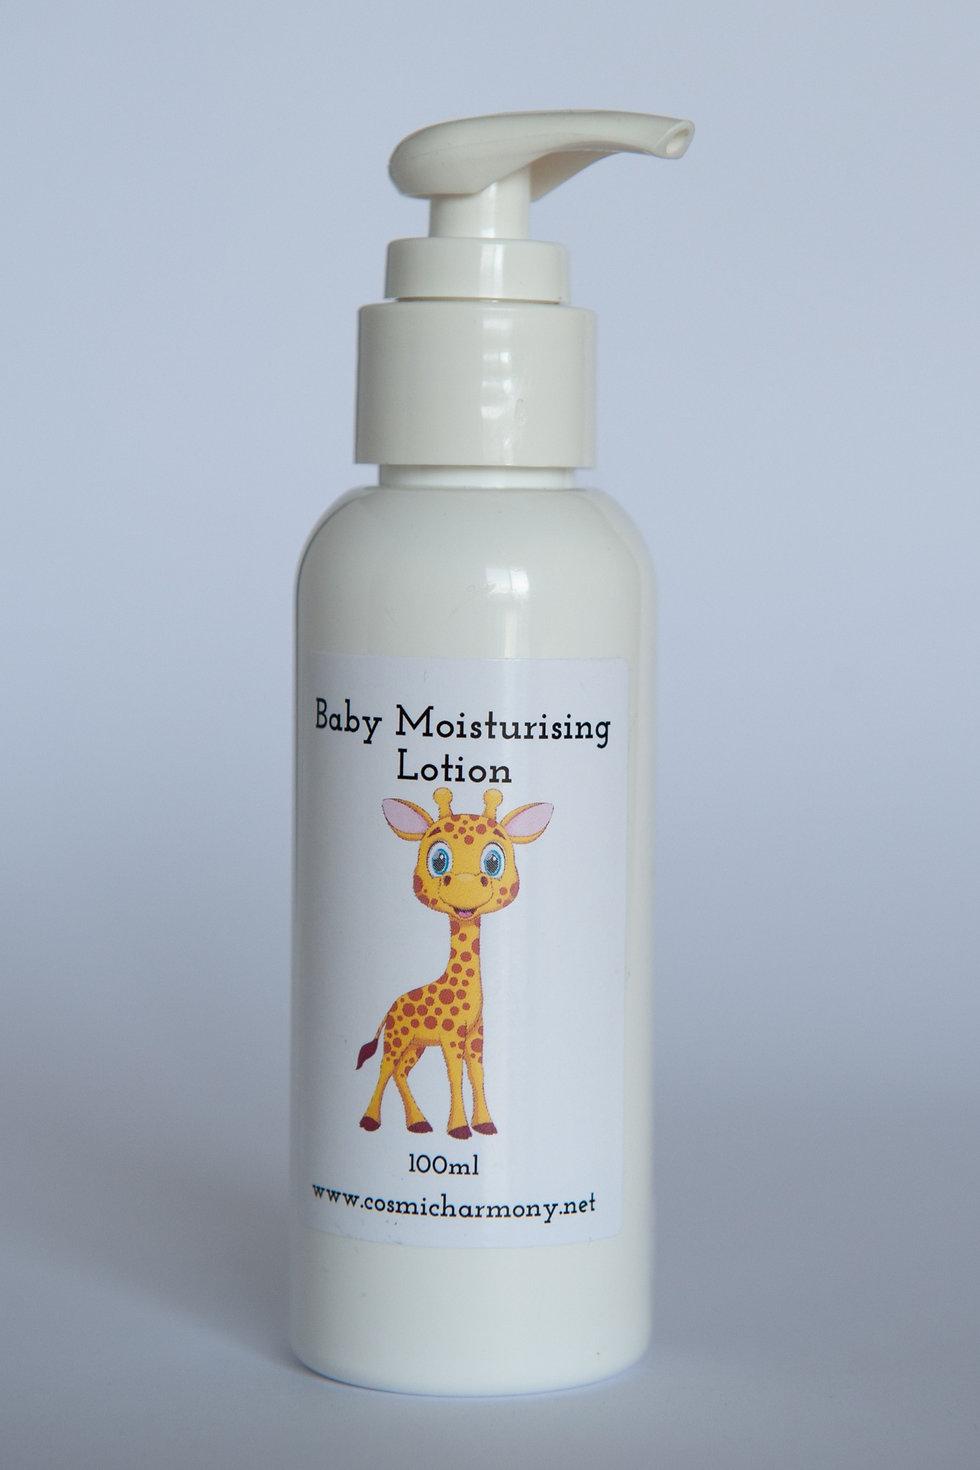 Baby Moisturising Lotion